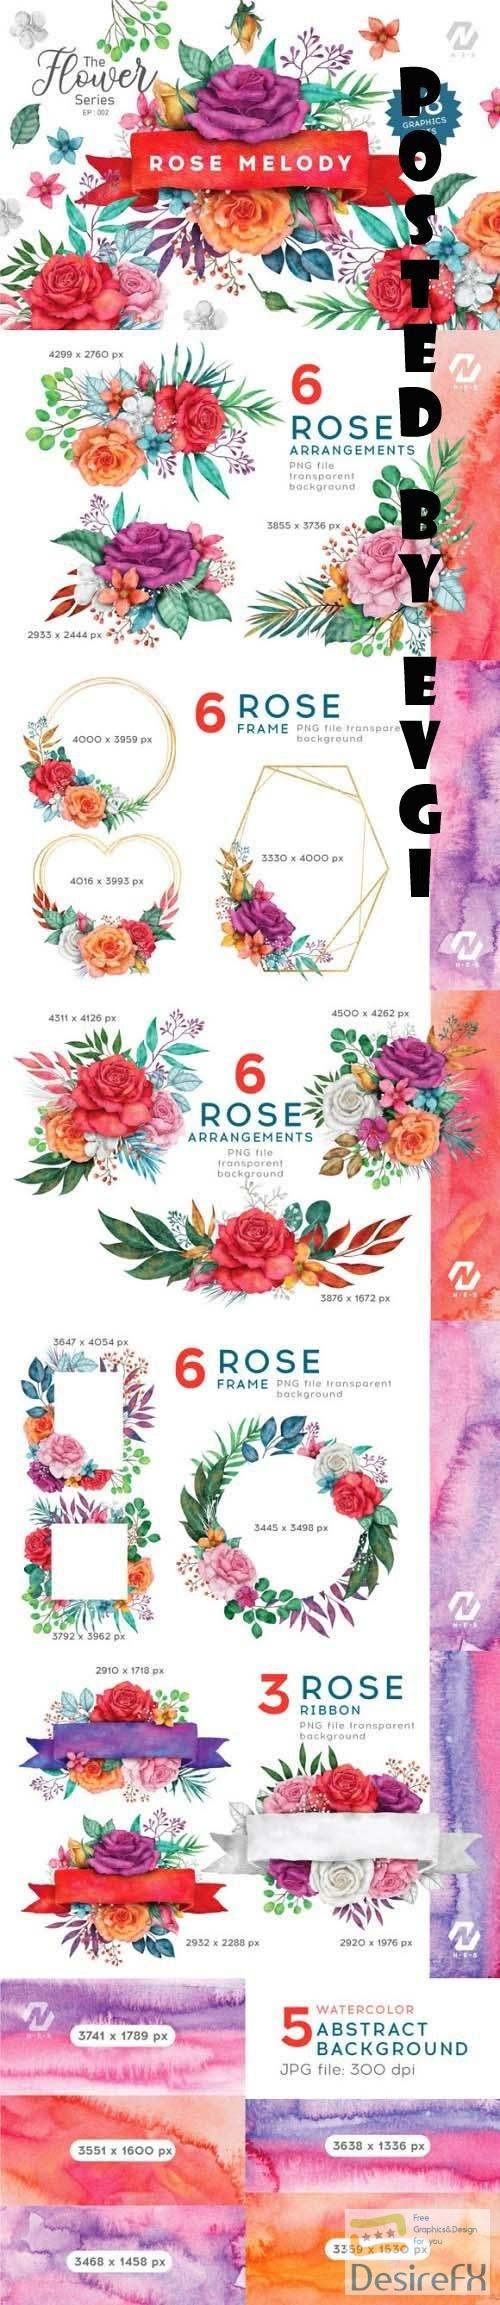 Rose Flower Watercolor Colorful Arts